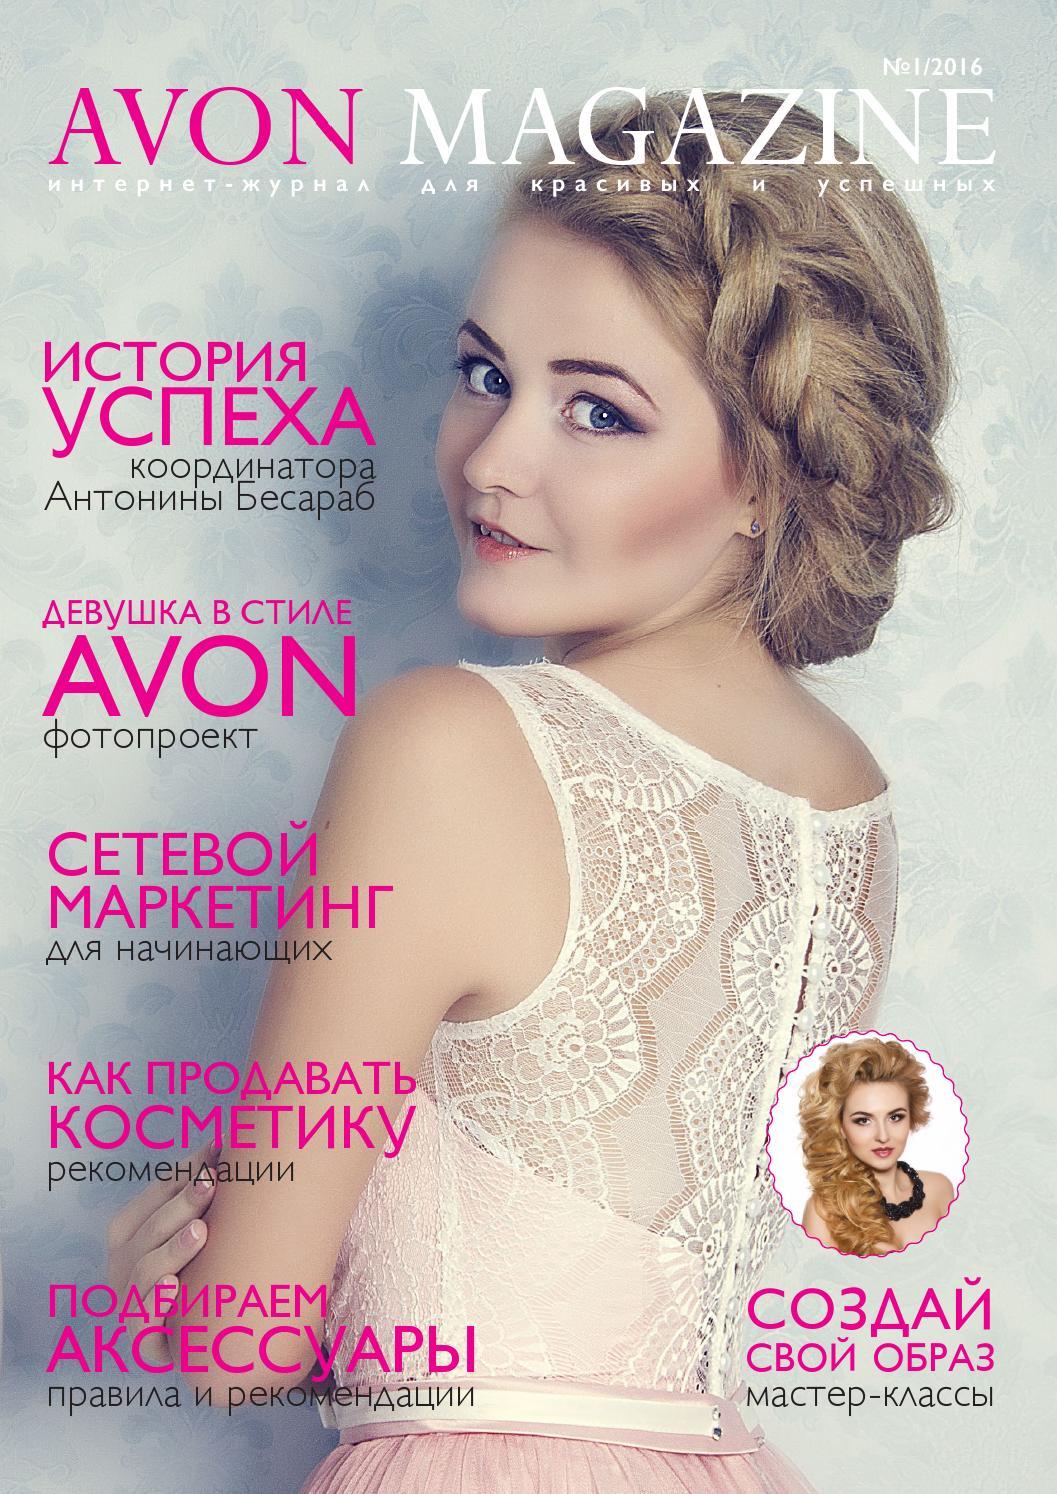 Avon magazine купить косметику натура сиберика в спб